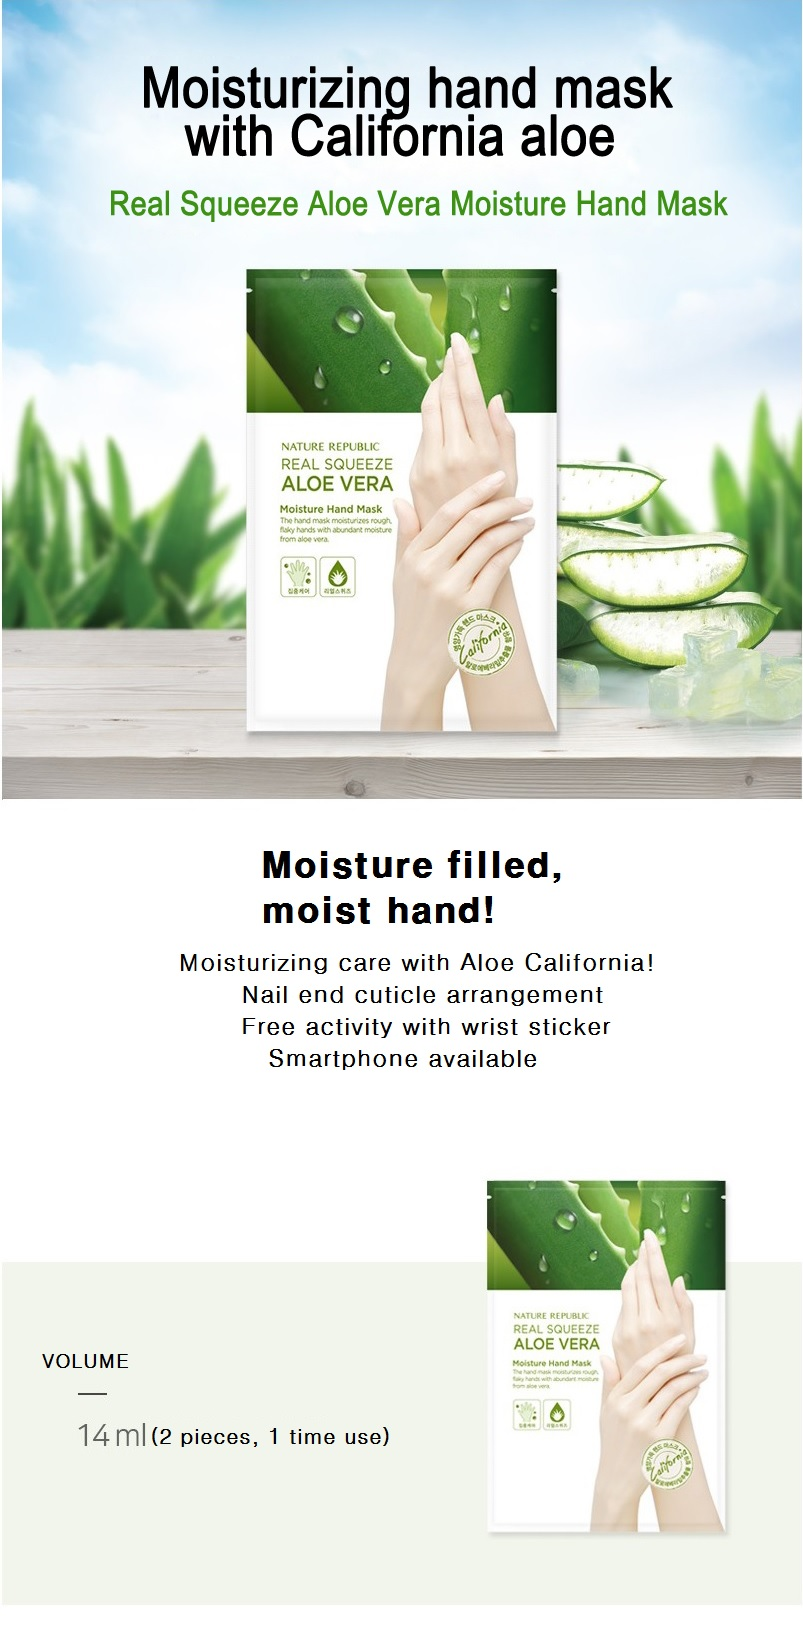 Nature Republic Real Squeeze Aloe Vera Moisture Hand Mask Korean Nr Shoothing Gel Republik 300ml